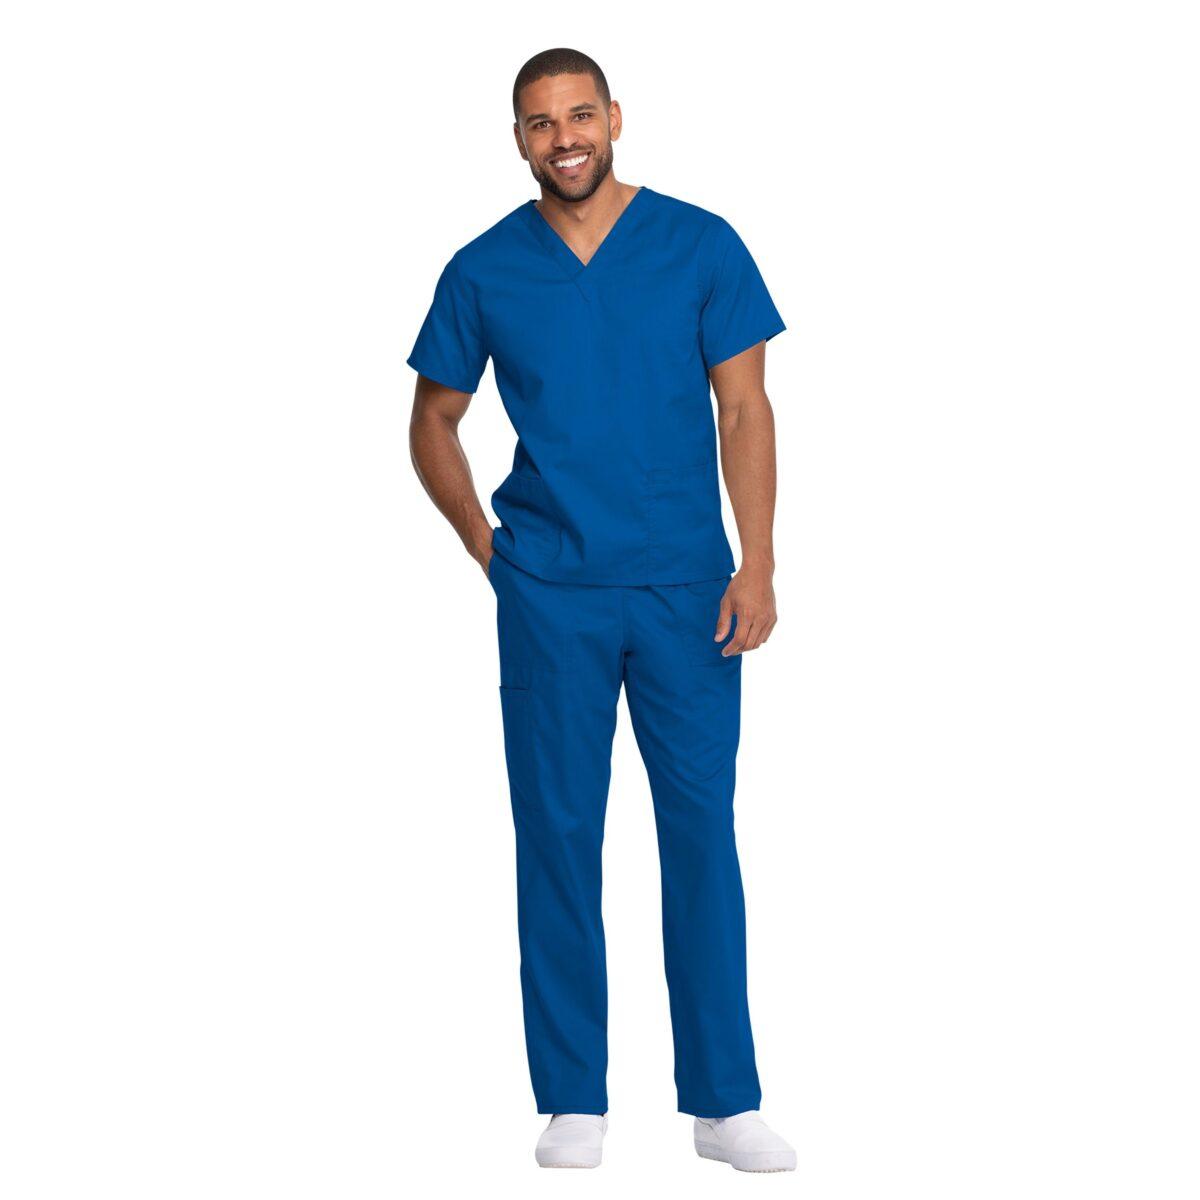 Мужской медицинский костюм Dickies цвет синий